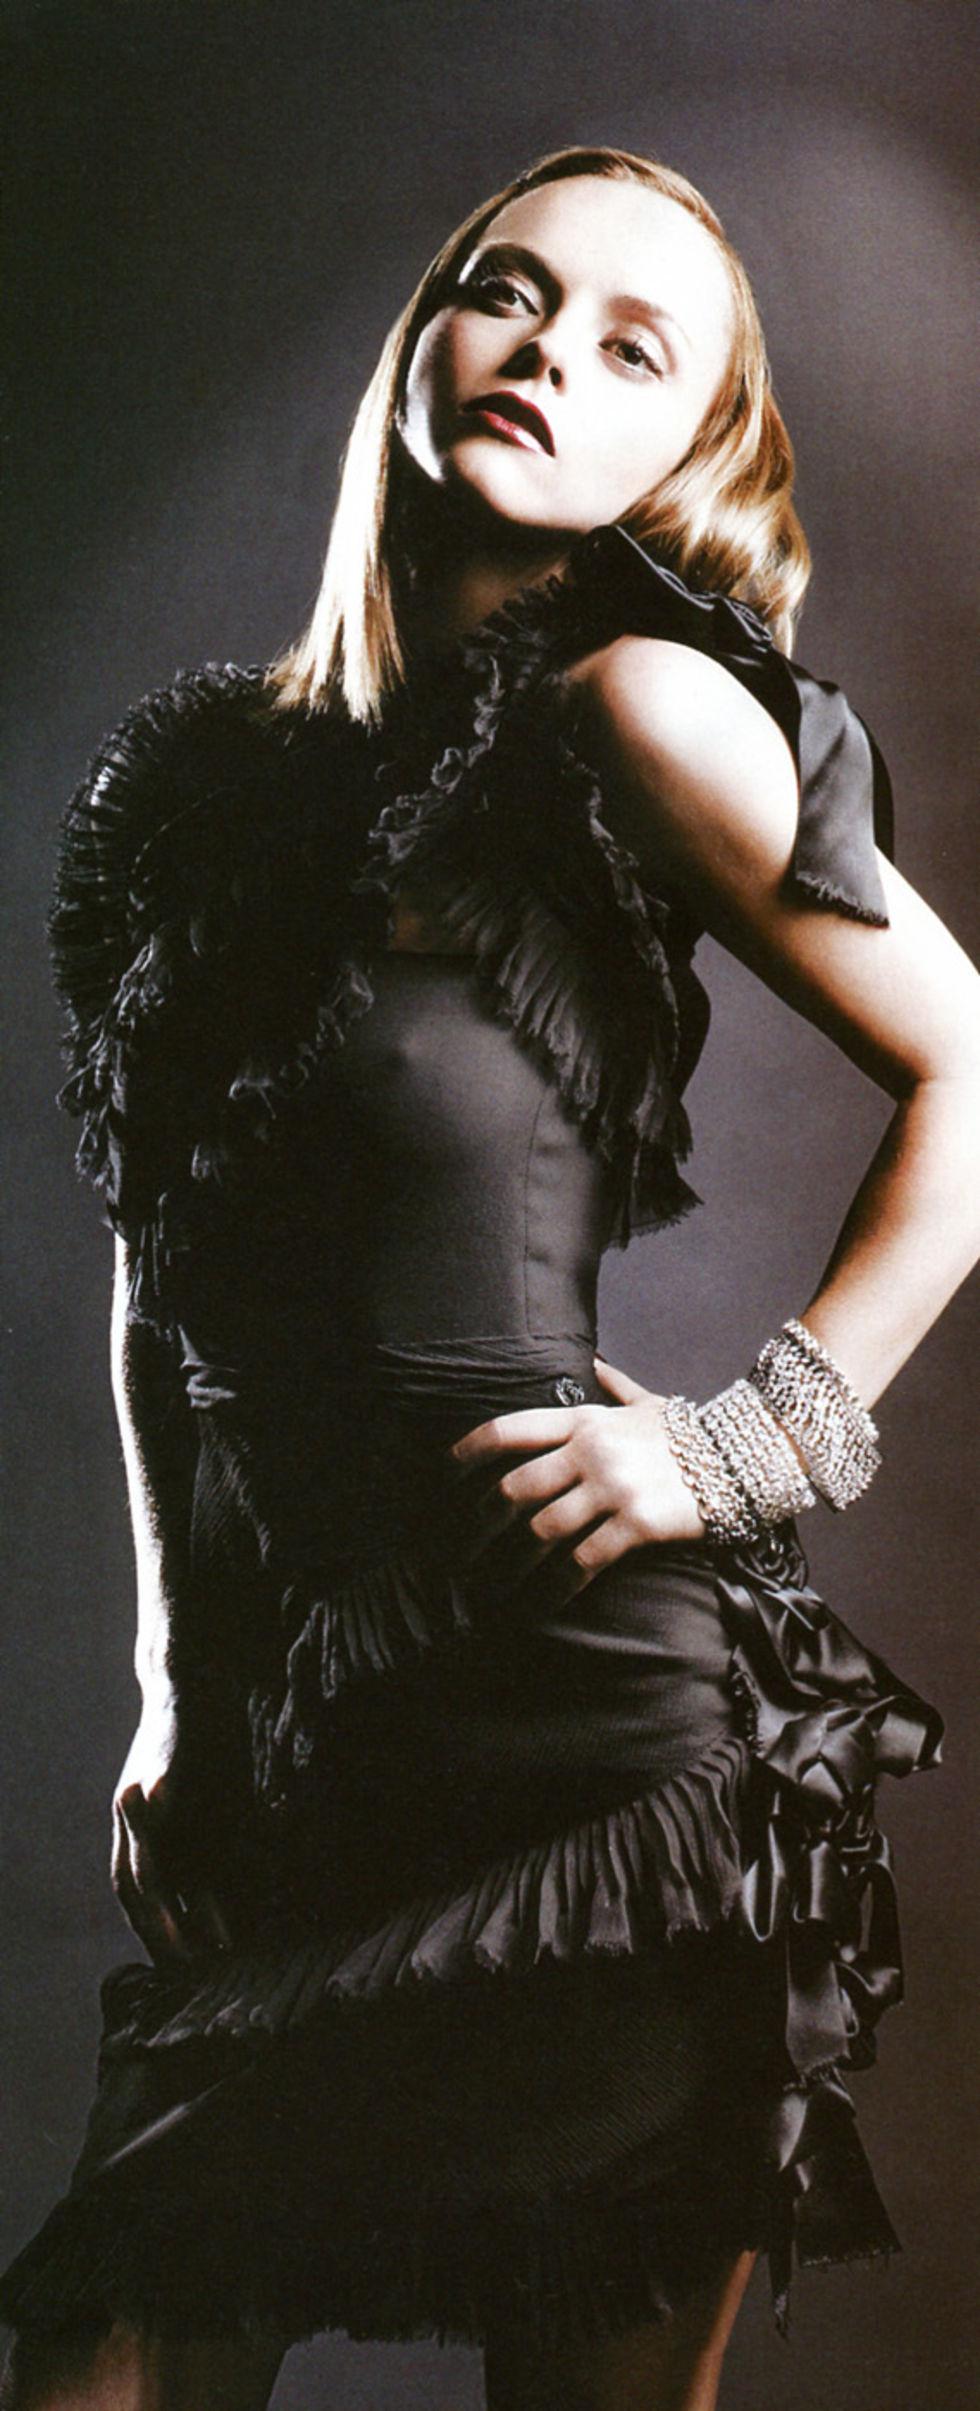 christina-ricci-vanity-fair-magazine-italy-octobrt-2008-01